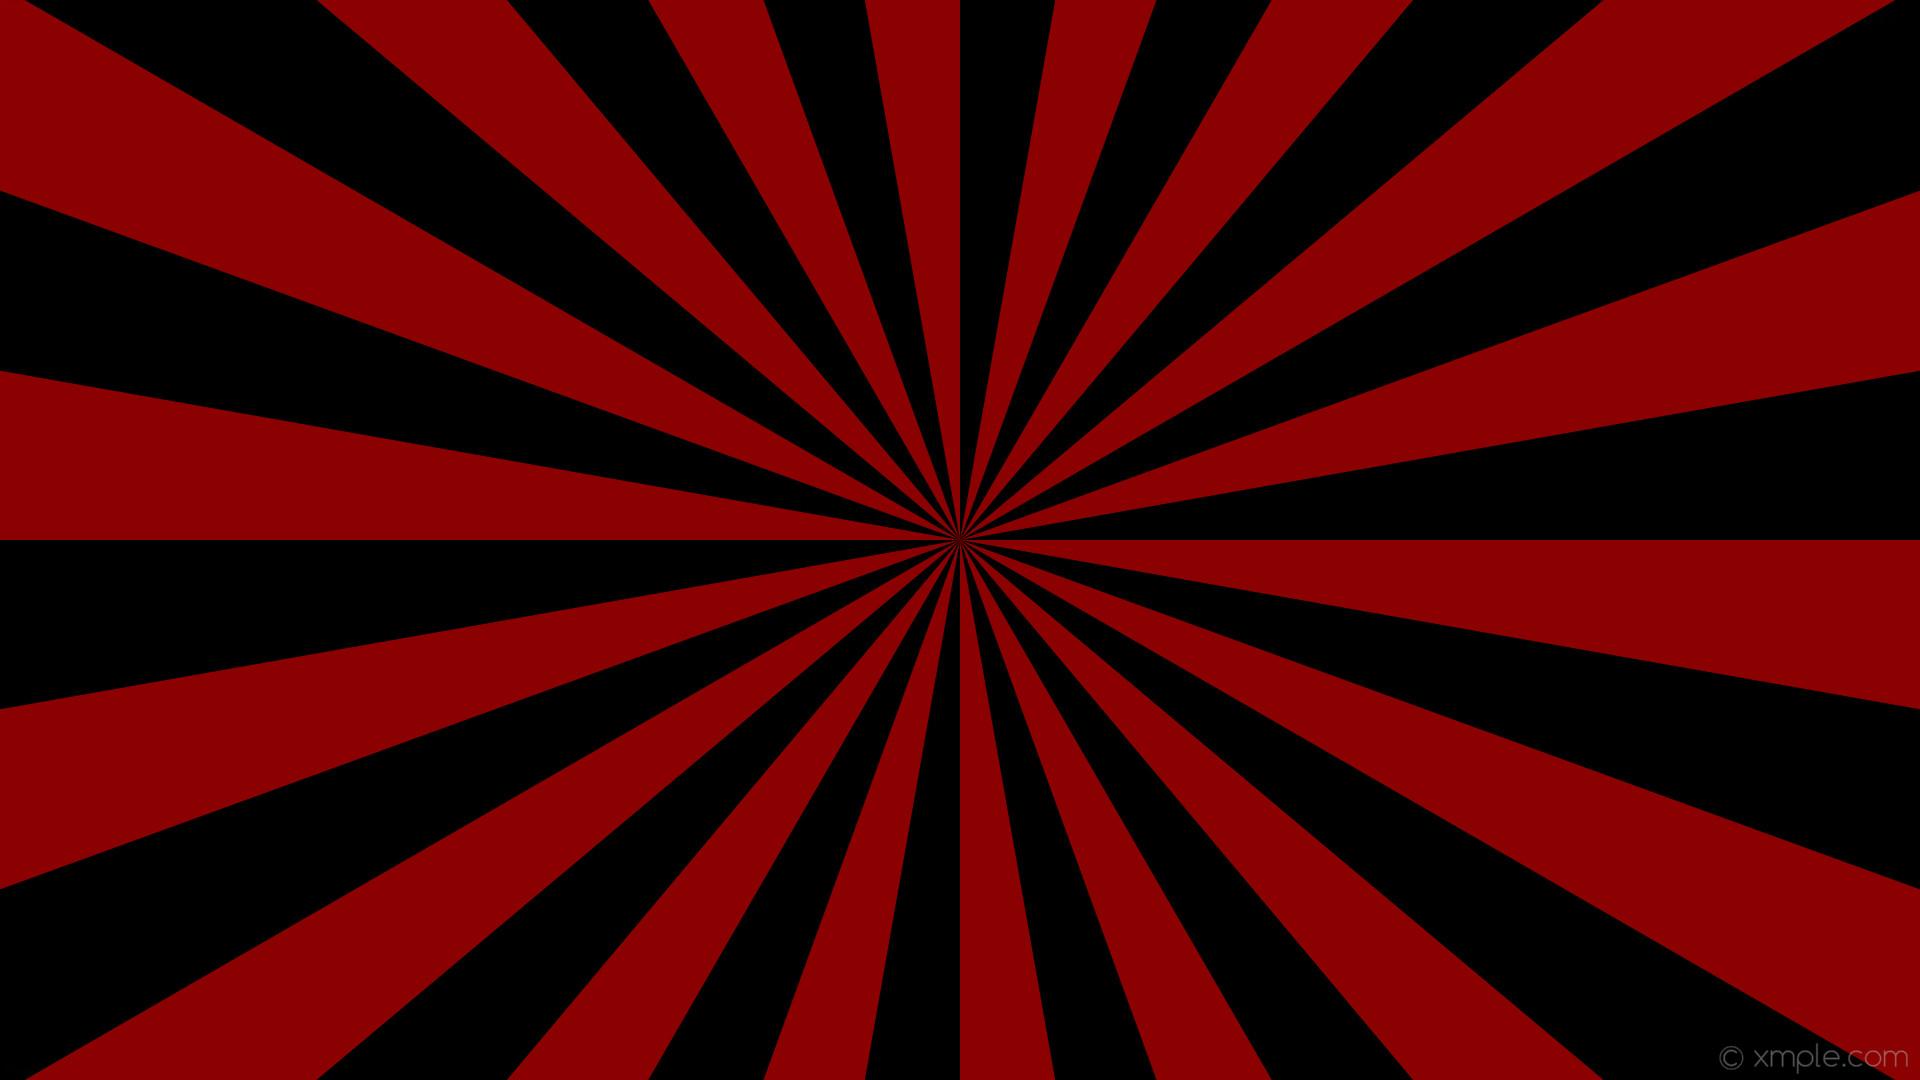 wallpaper rays black red burst sunburst dark red #8b0000 #000000 10° 18 0